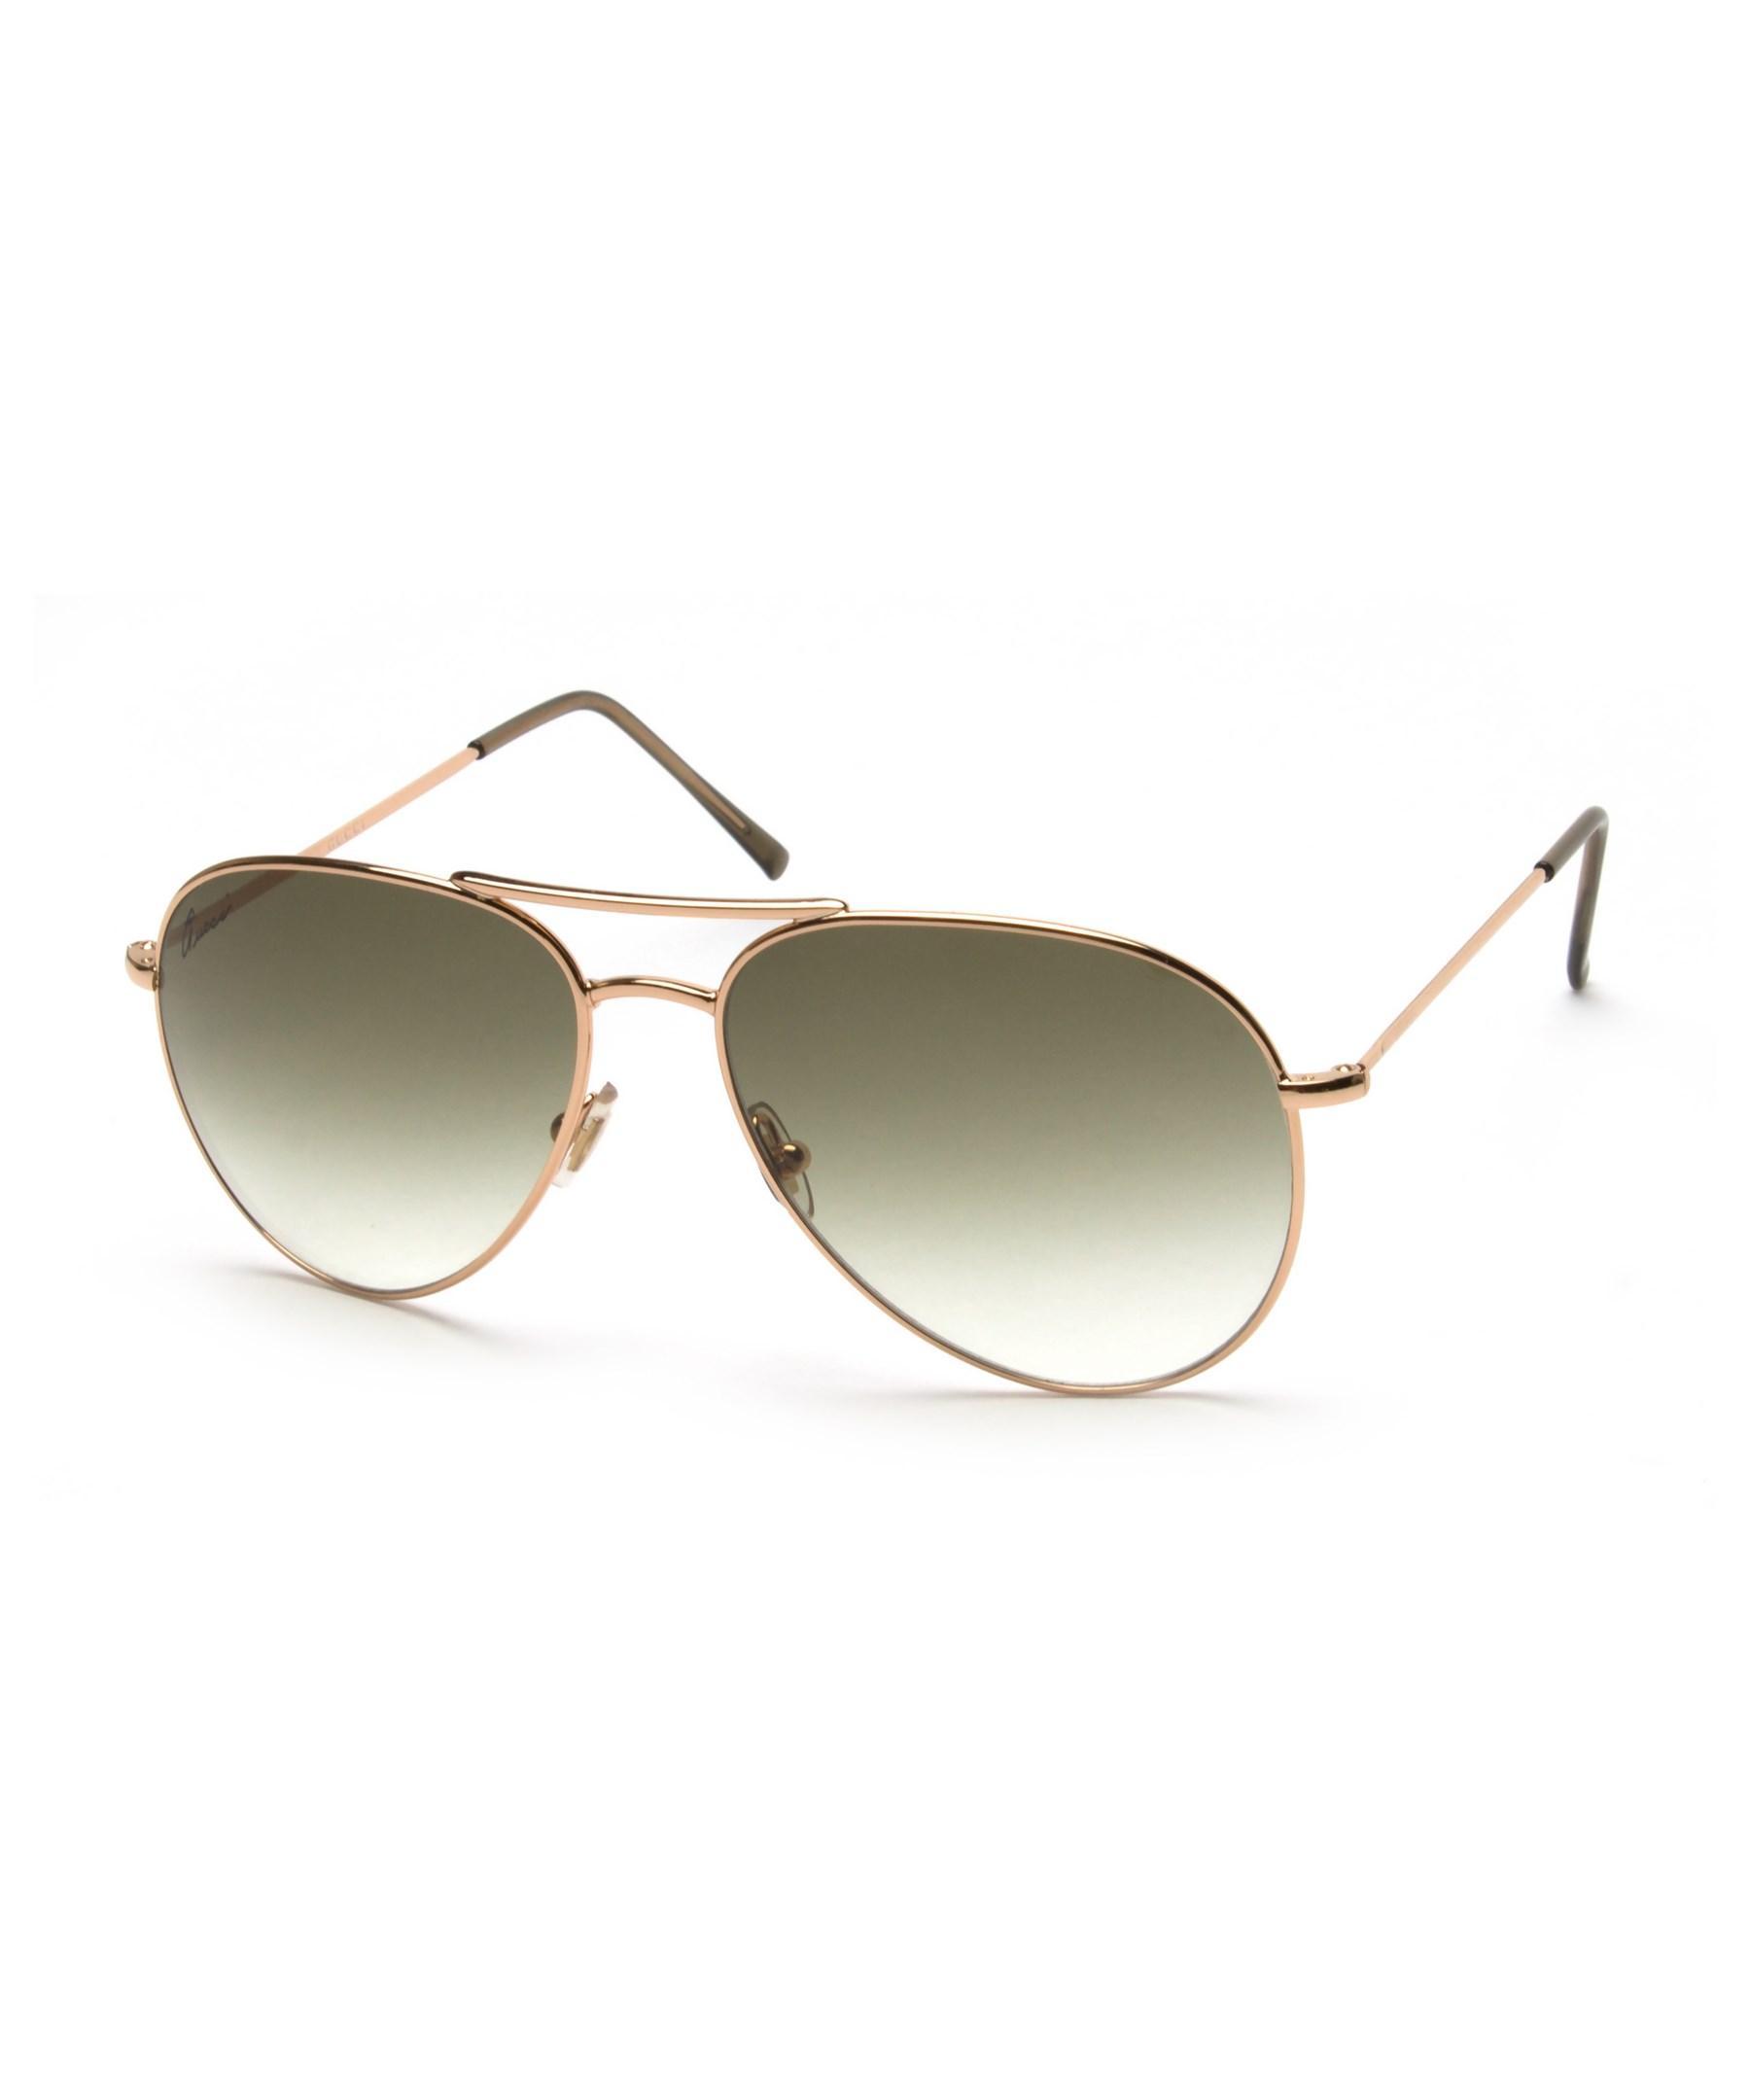 12dd8c903dd5 Lyst - Gucci Men s Women s Unisex Aviator Sunglasses 1287 s Rose ...